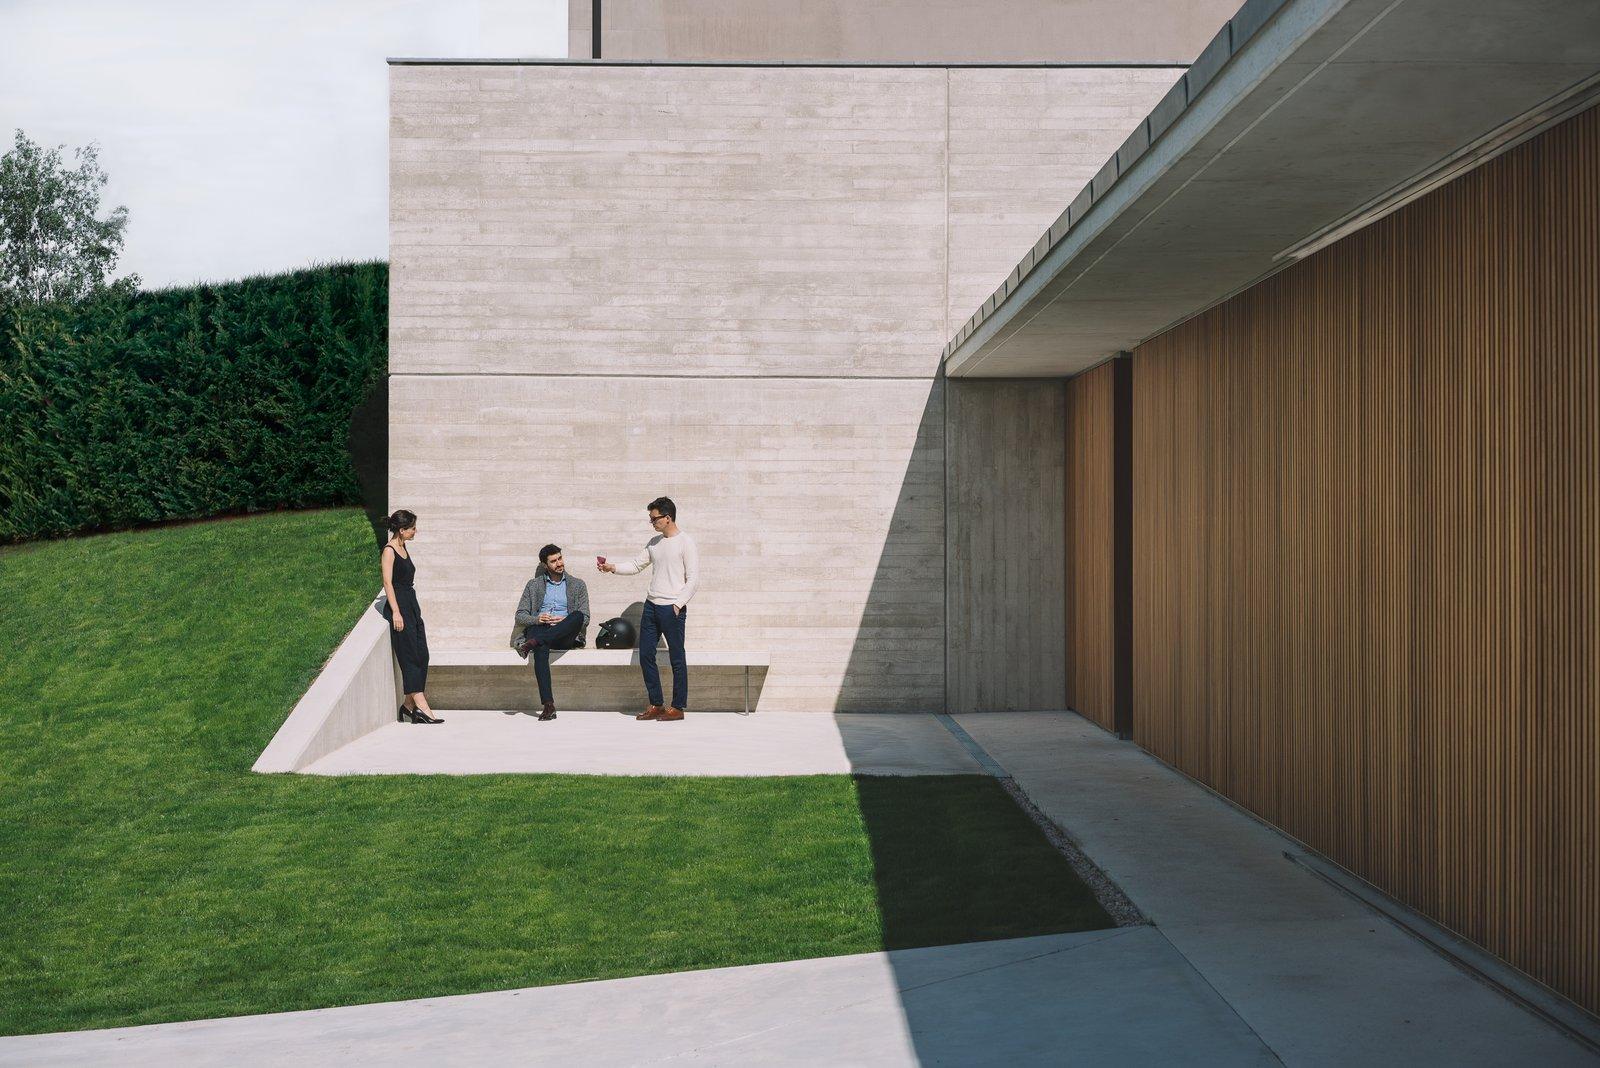 Outdoor, Front Yard, Gardens, Garden, Grass, Wood Patio, Porch, Deck, Metal Patio, Porch, Deck, and Concrete Patio, Porch, Deck  The Öcher House by MLMR Architecture Consultancy